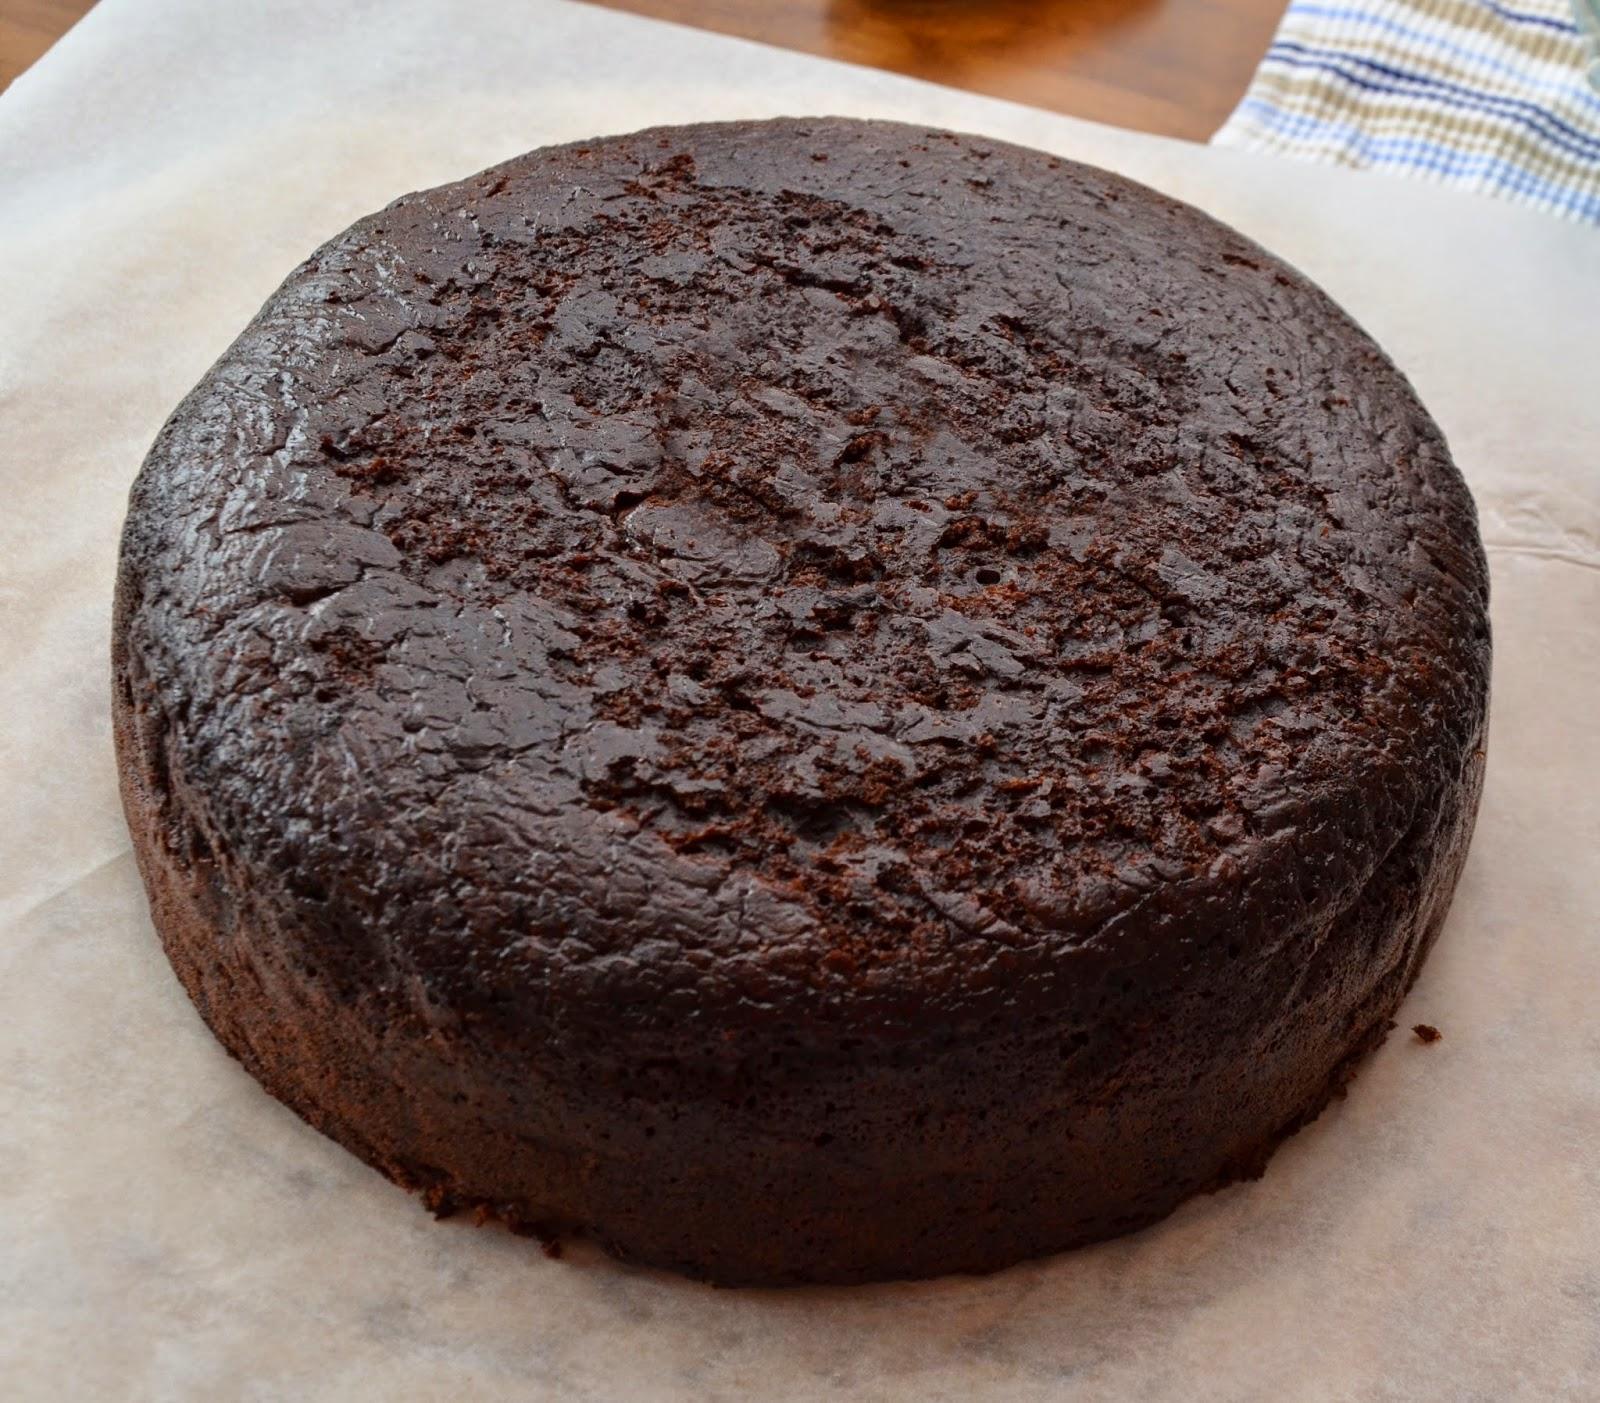 glutenfri tårtbotten recept